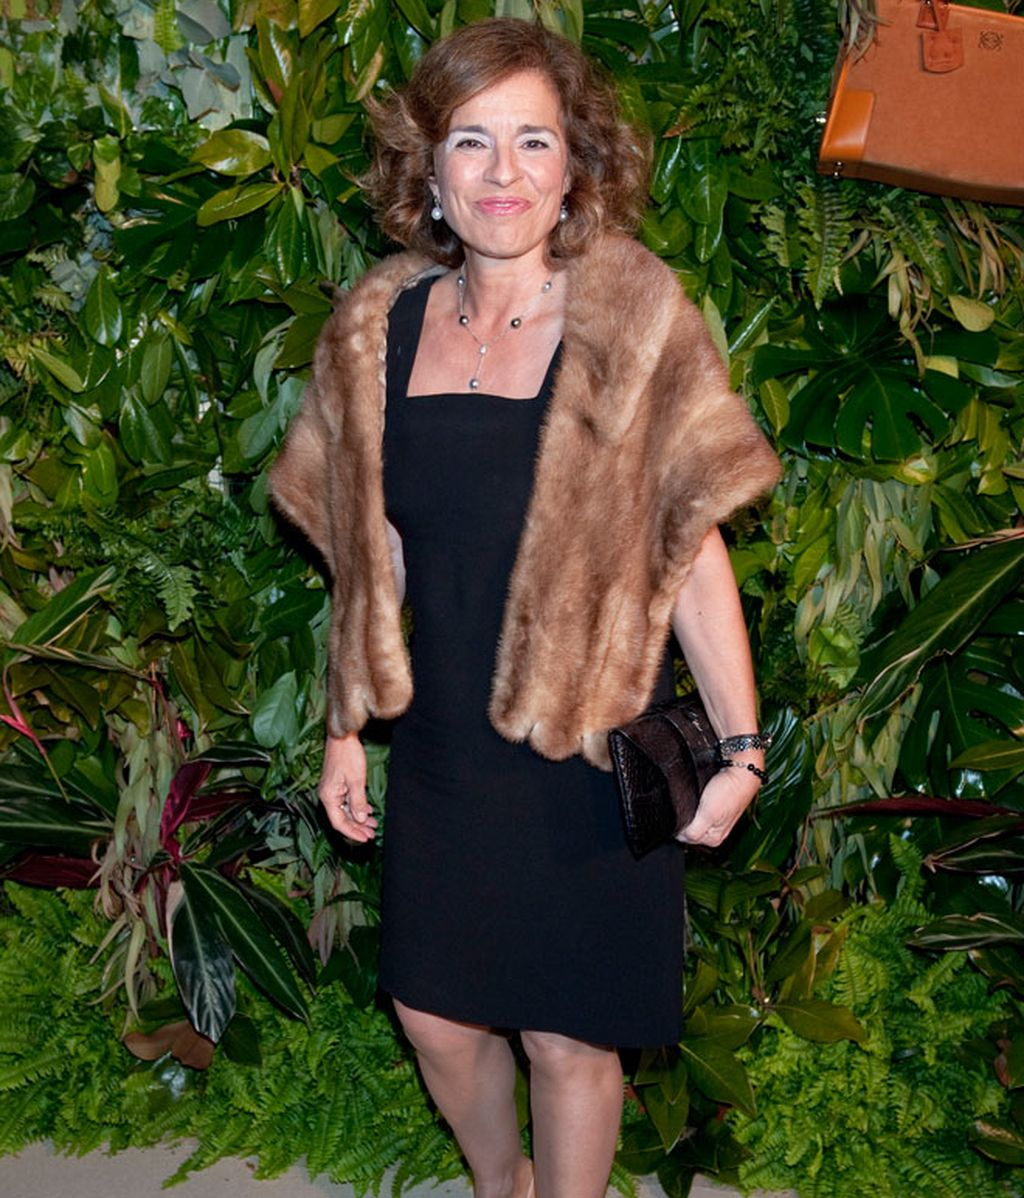 Loewe regresa a Madrid y reúne a Lomana y la Preysler